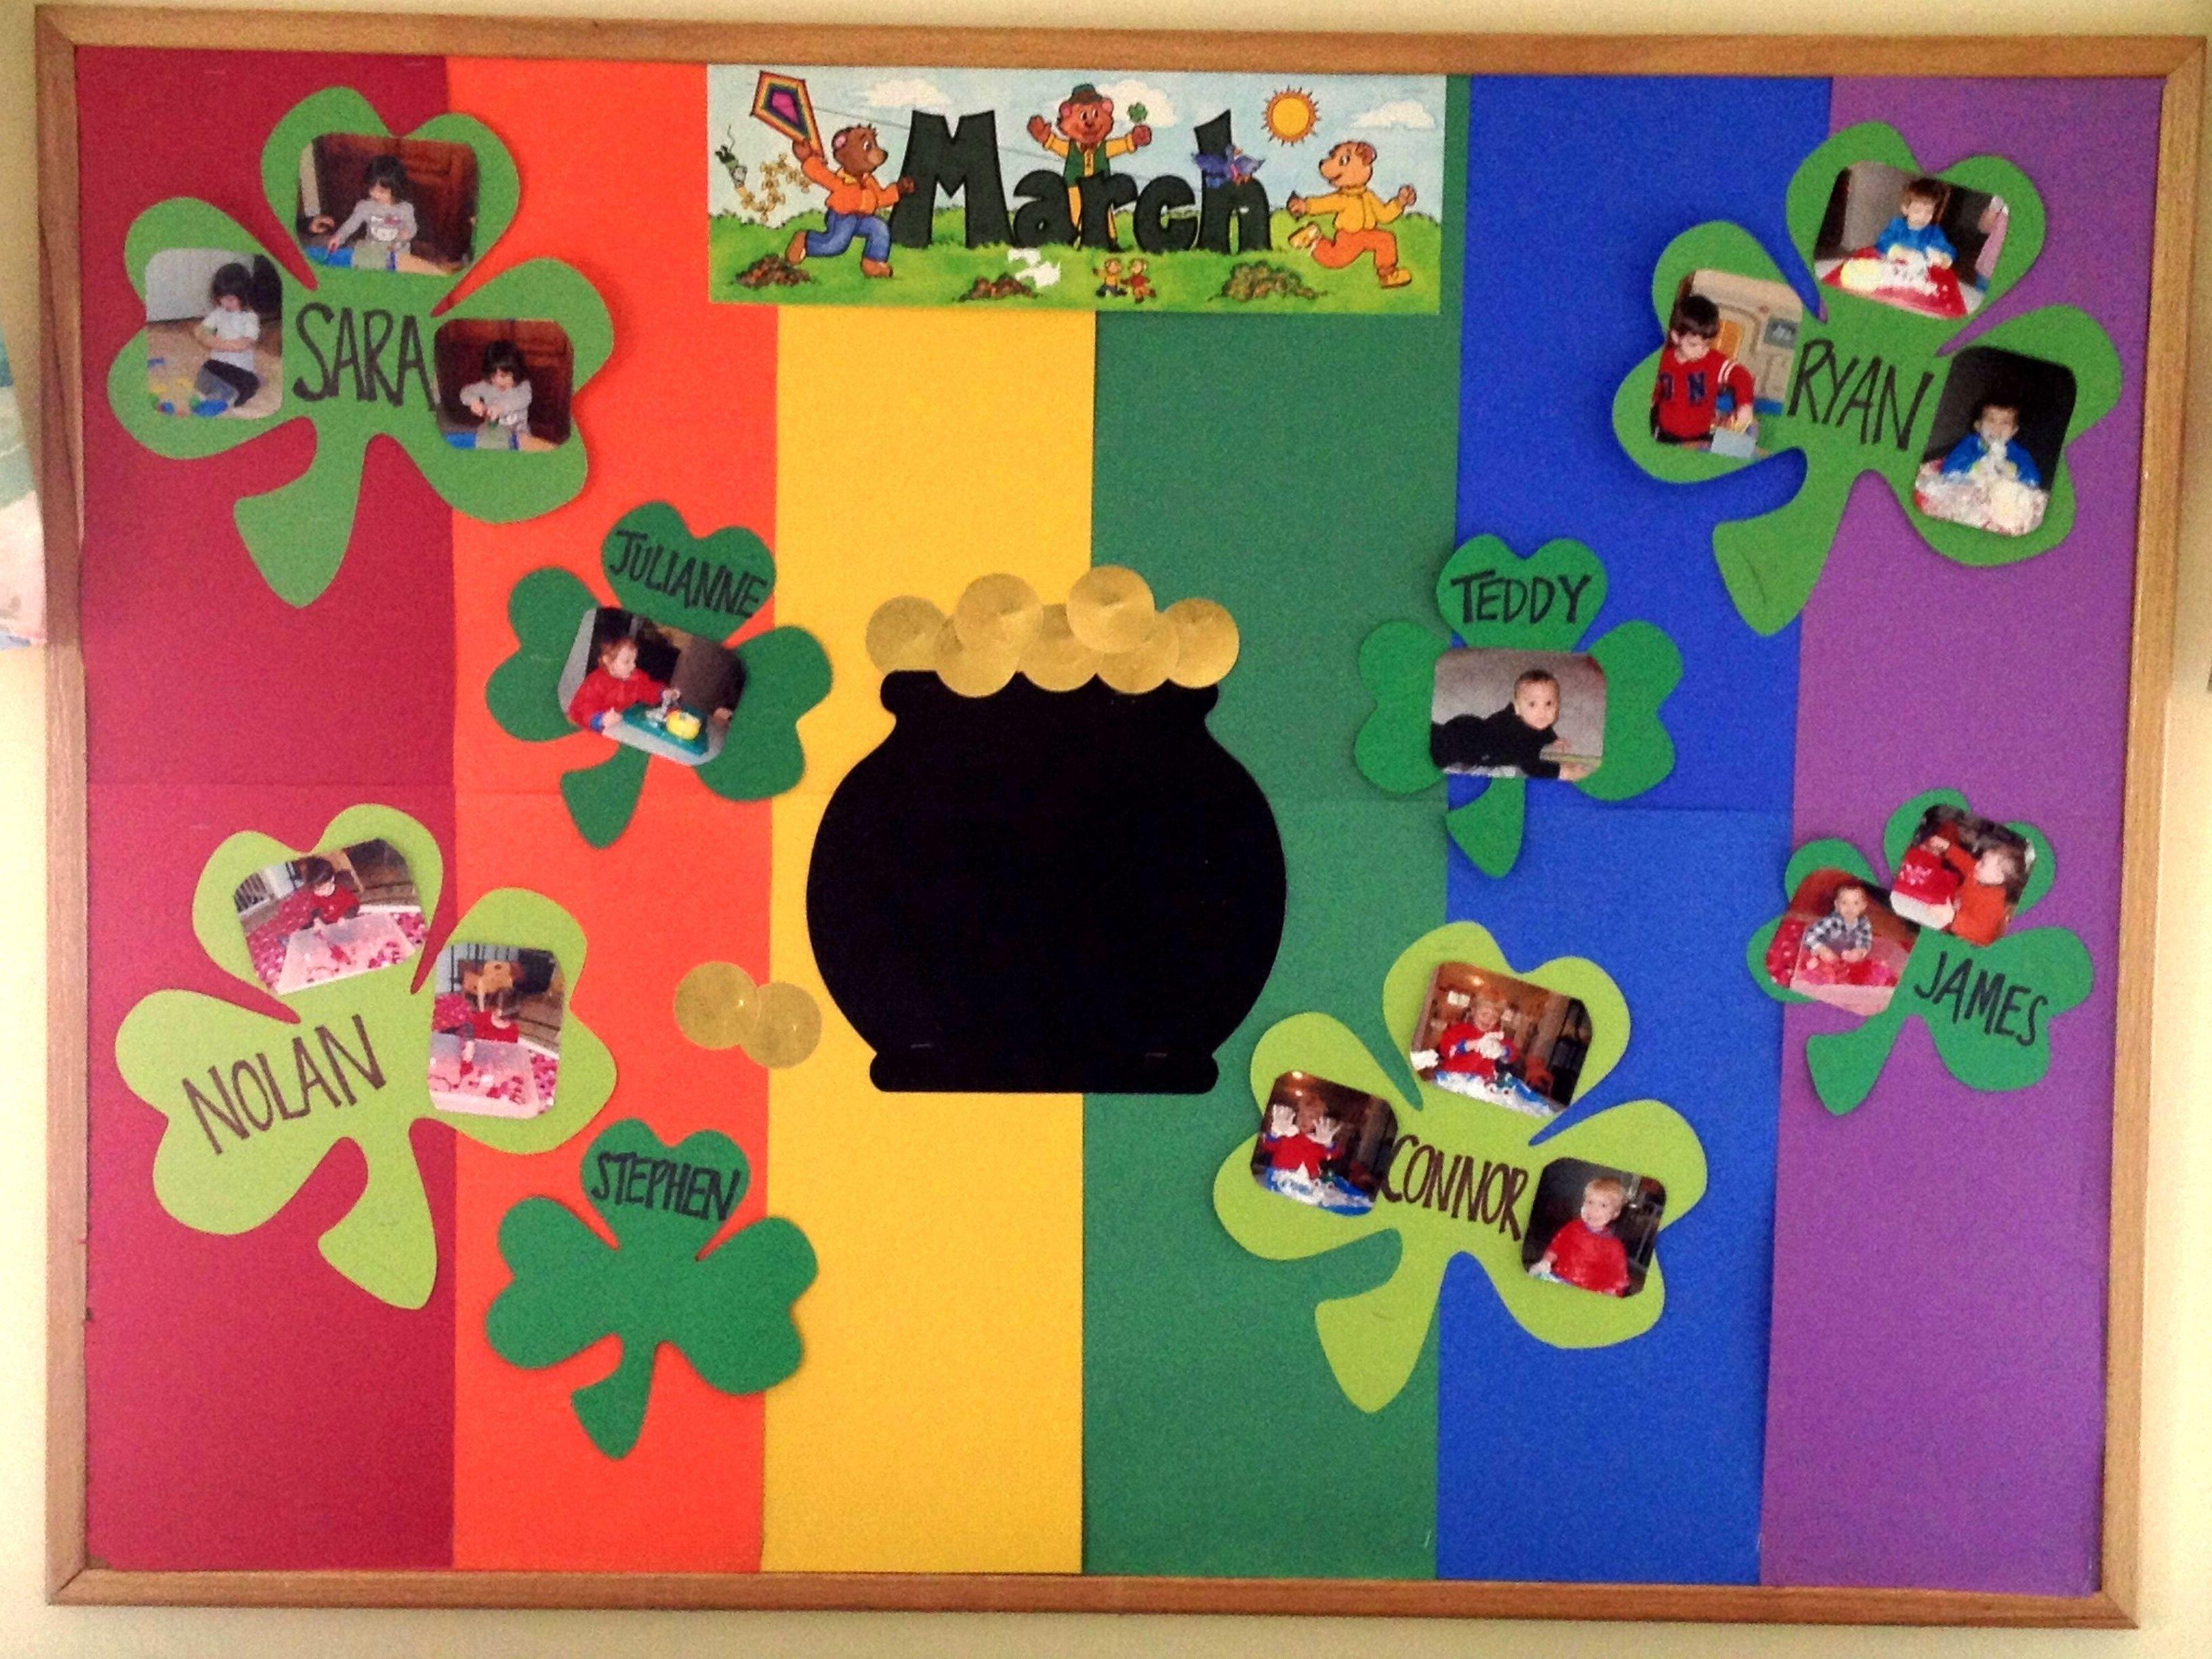 10 Stylish Preschool March Bulletin Board Ideas march bulletin board joeys class pinterest bulletin board 1 2020